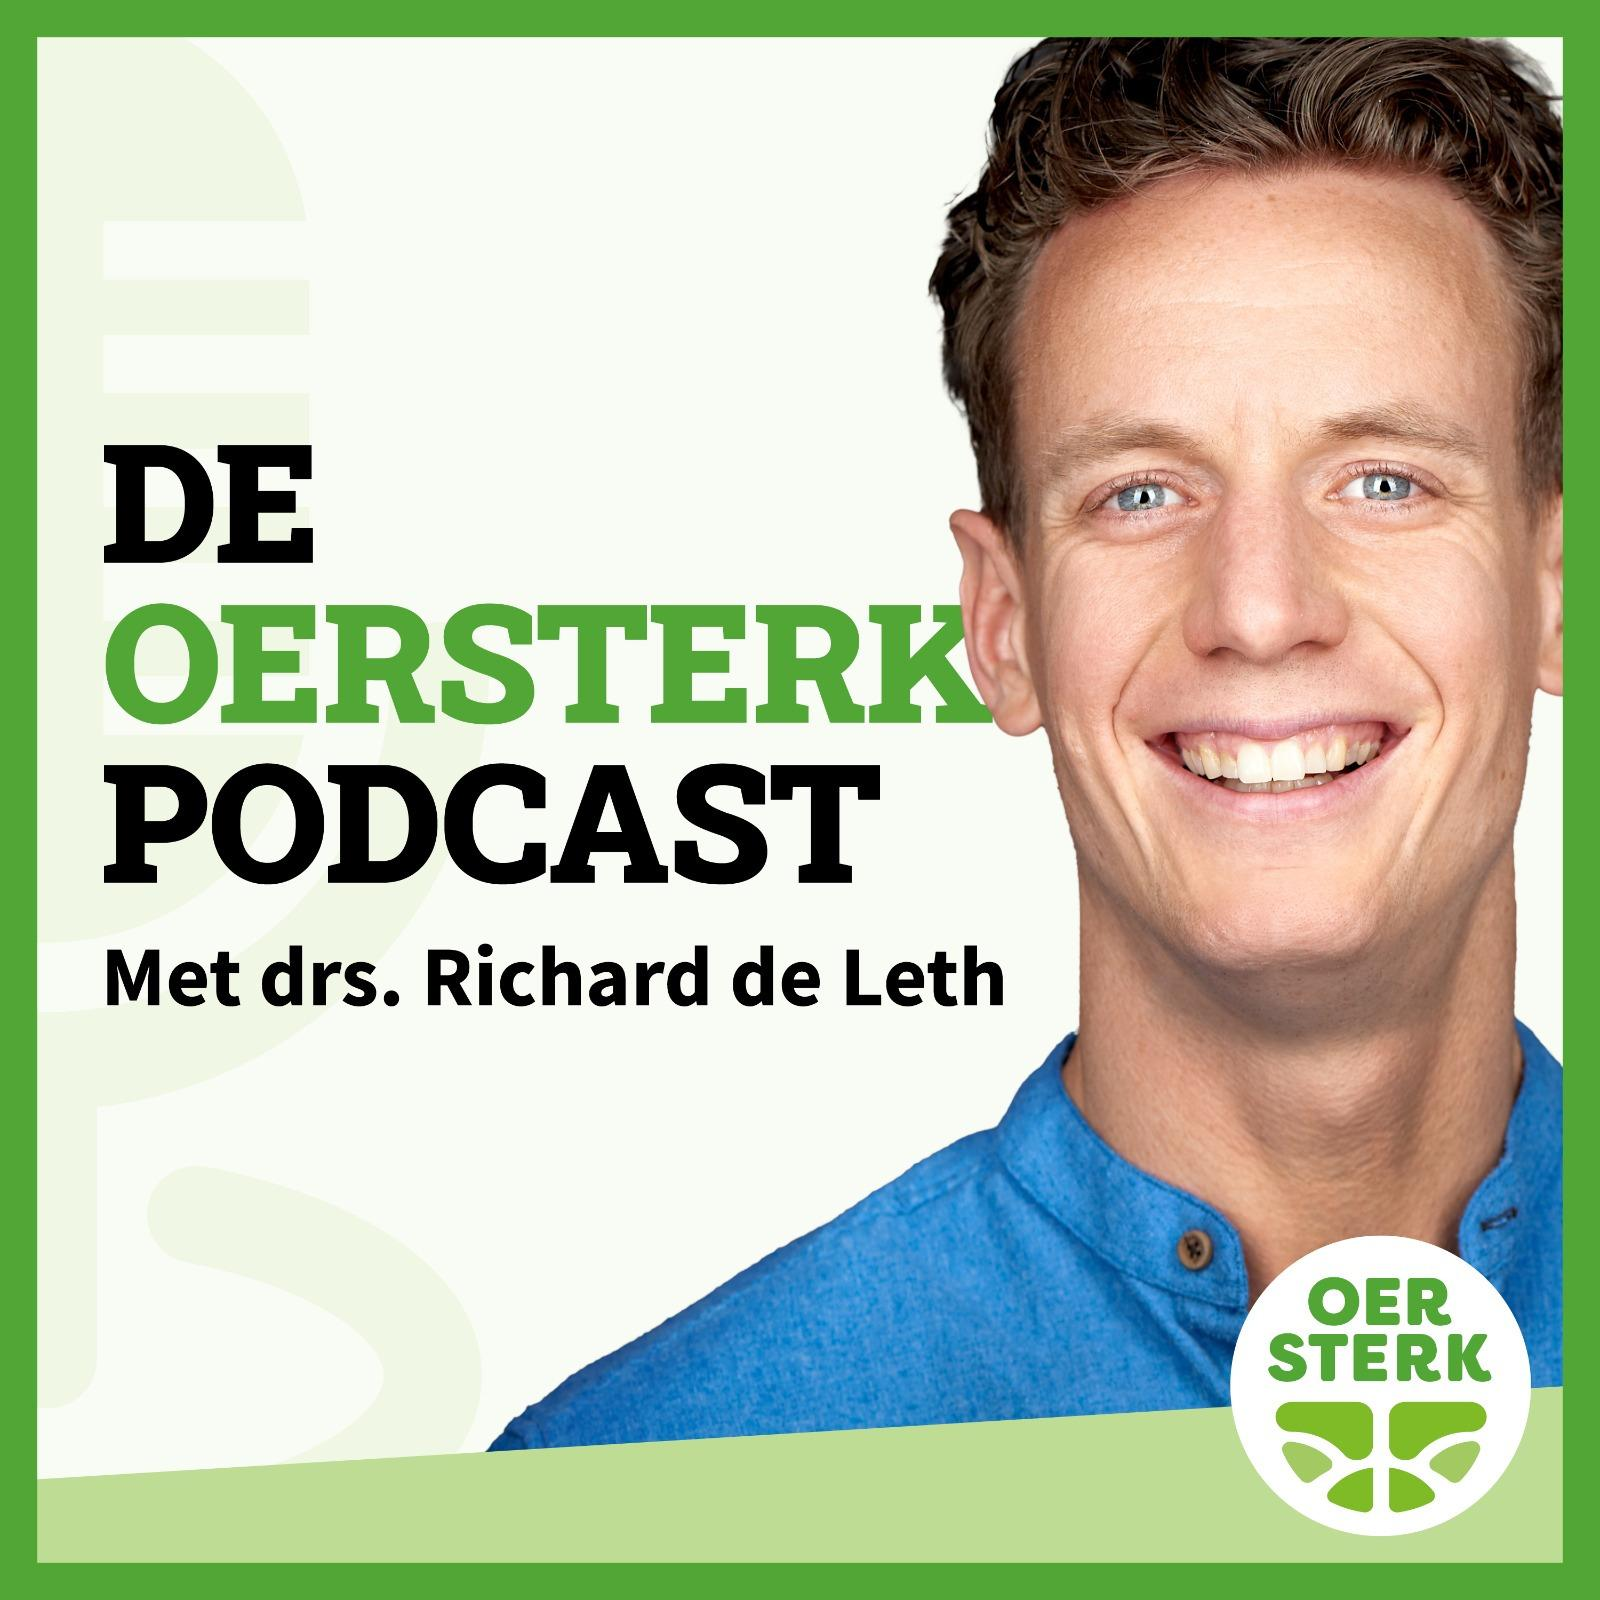 OERsterk Podcast met drs. Richard de Leth logo